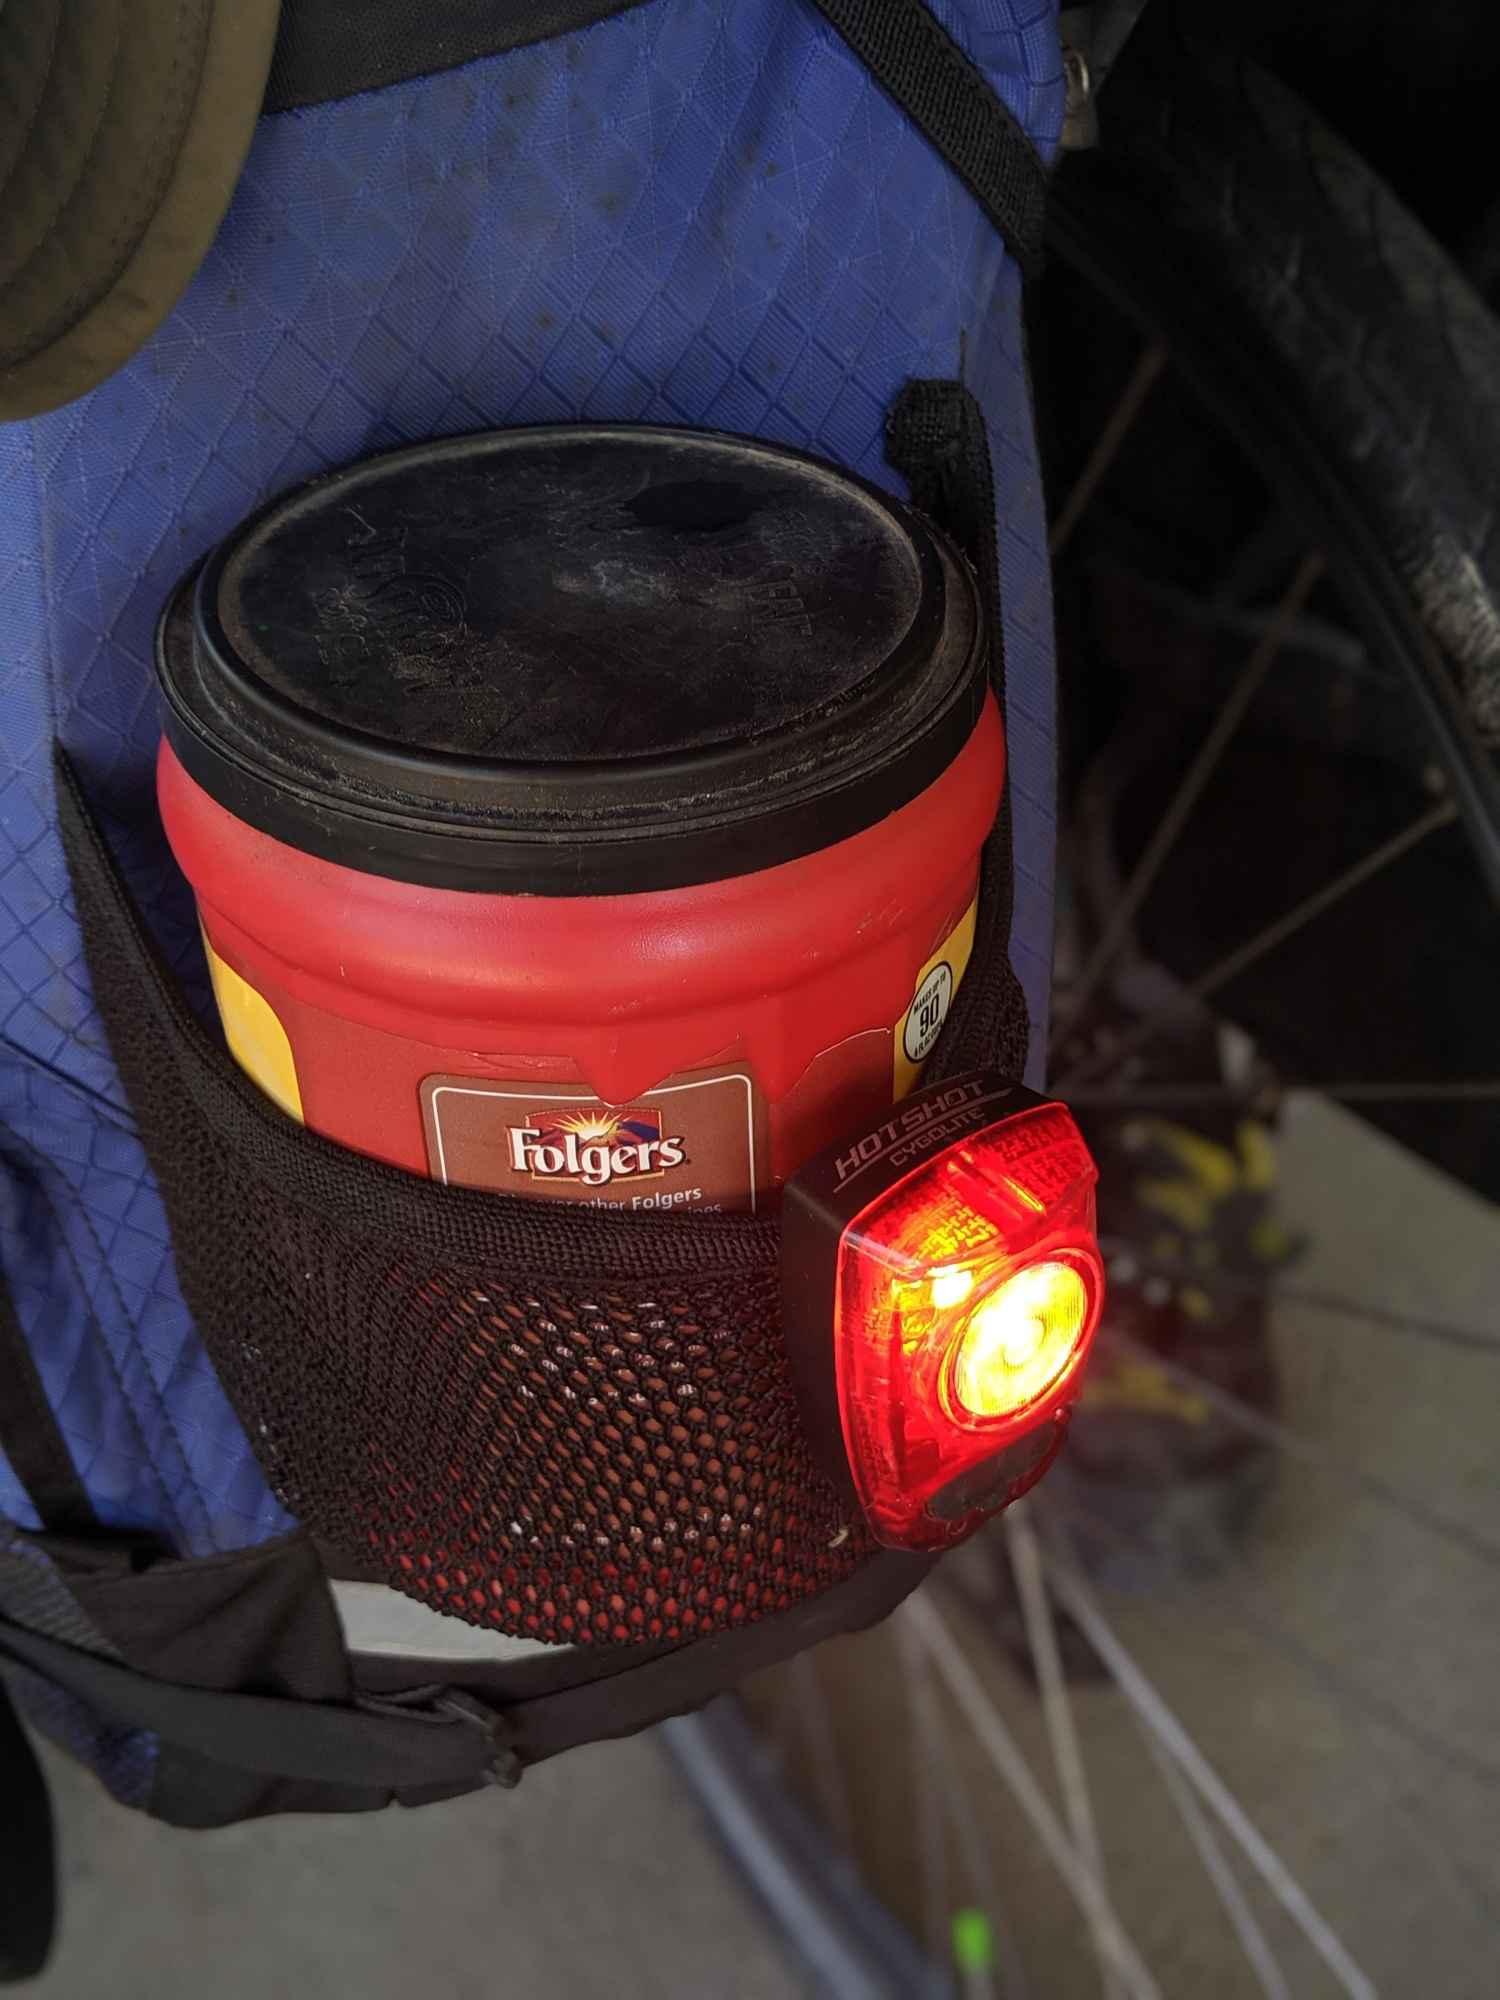 Brandon mounts his rear red light near his coffee can.   Photo by Liz Thomas.